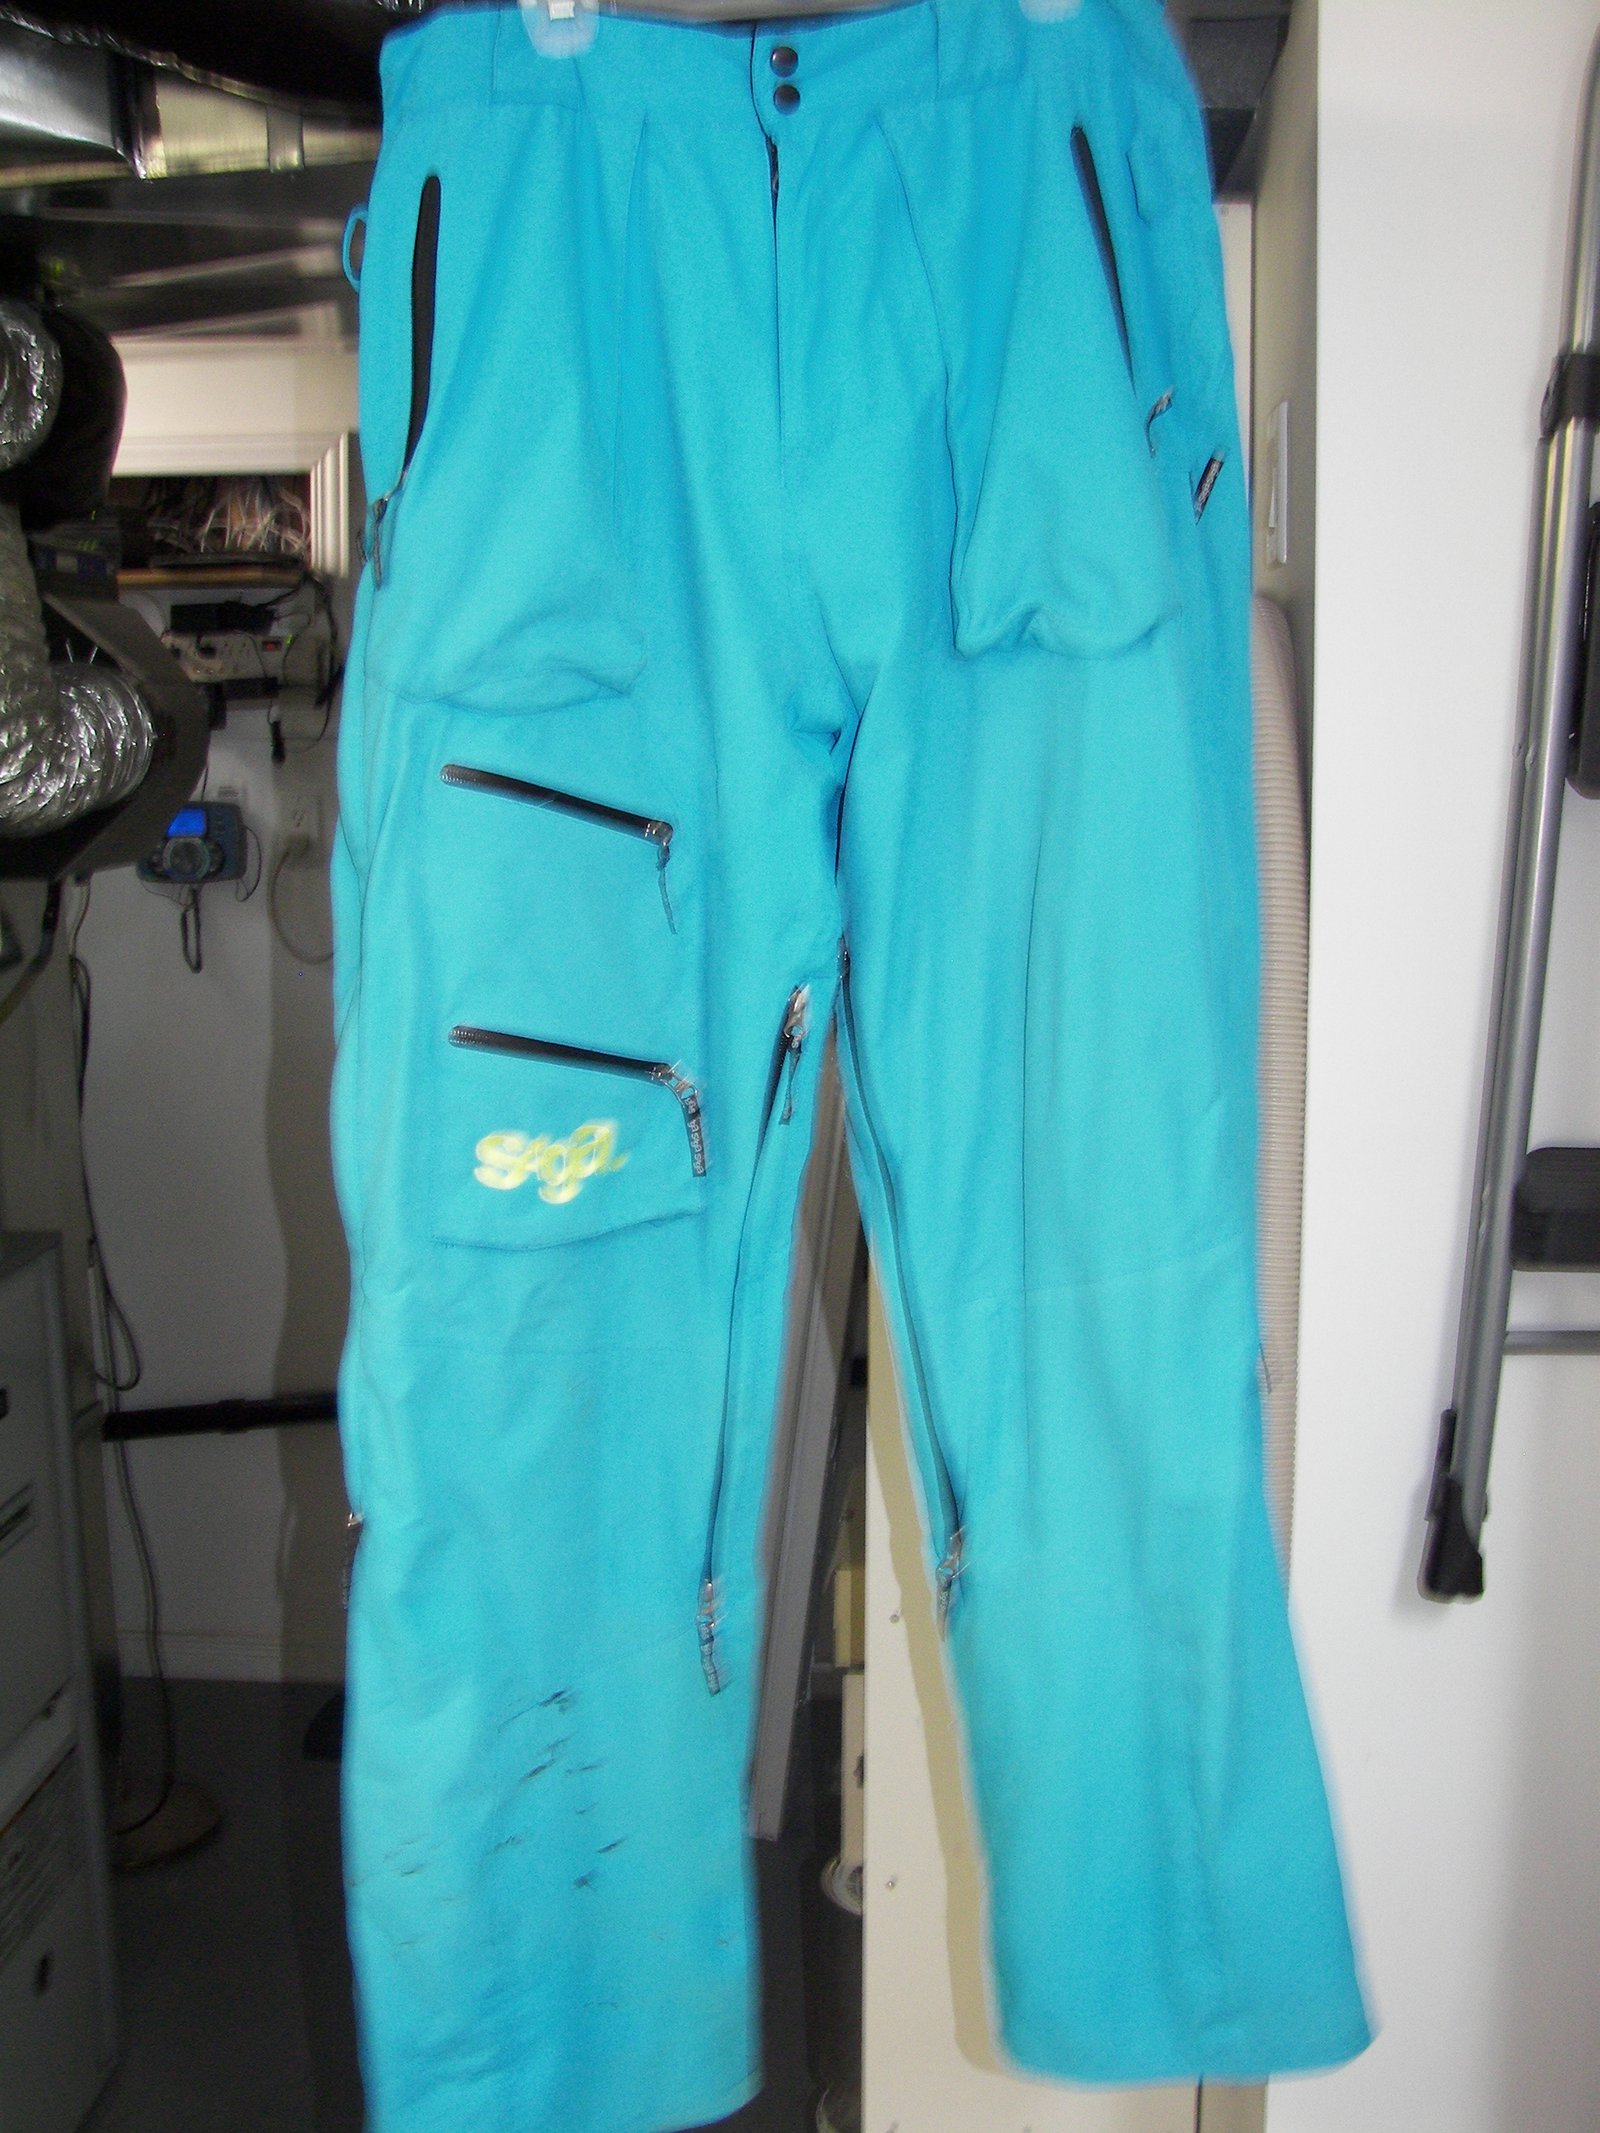 Saga Hybrid Pants size large